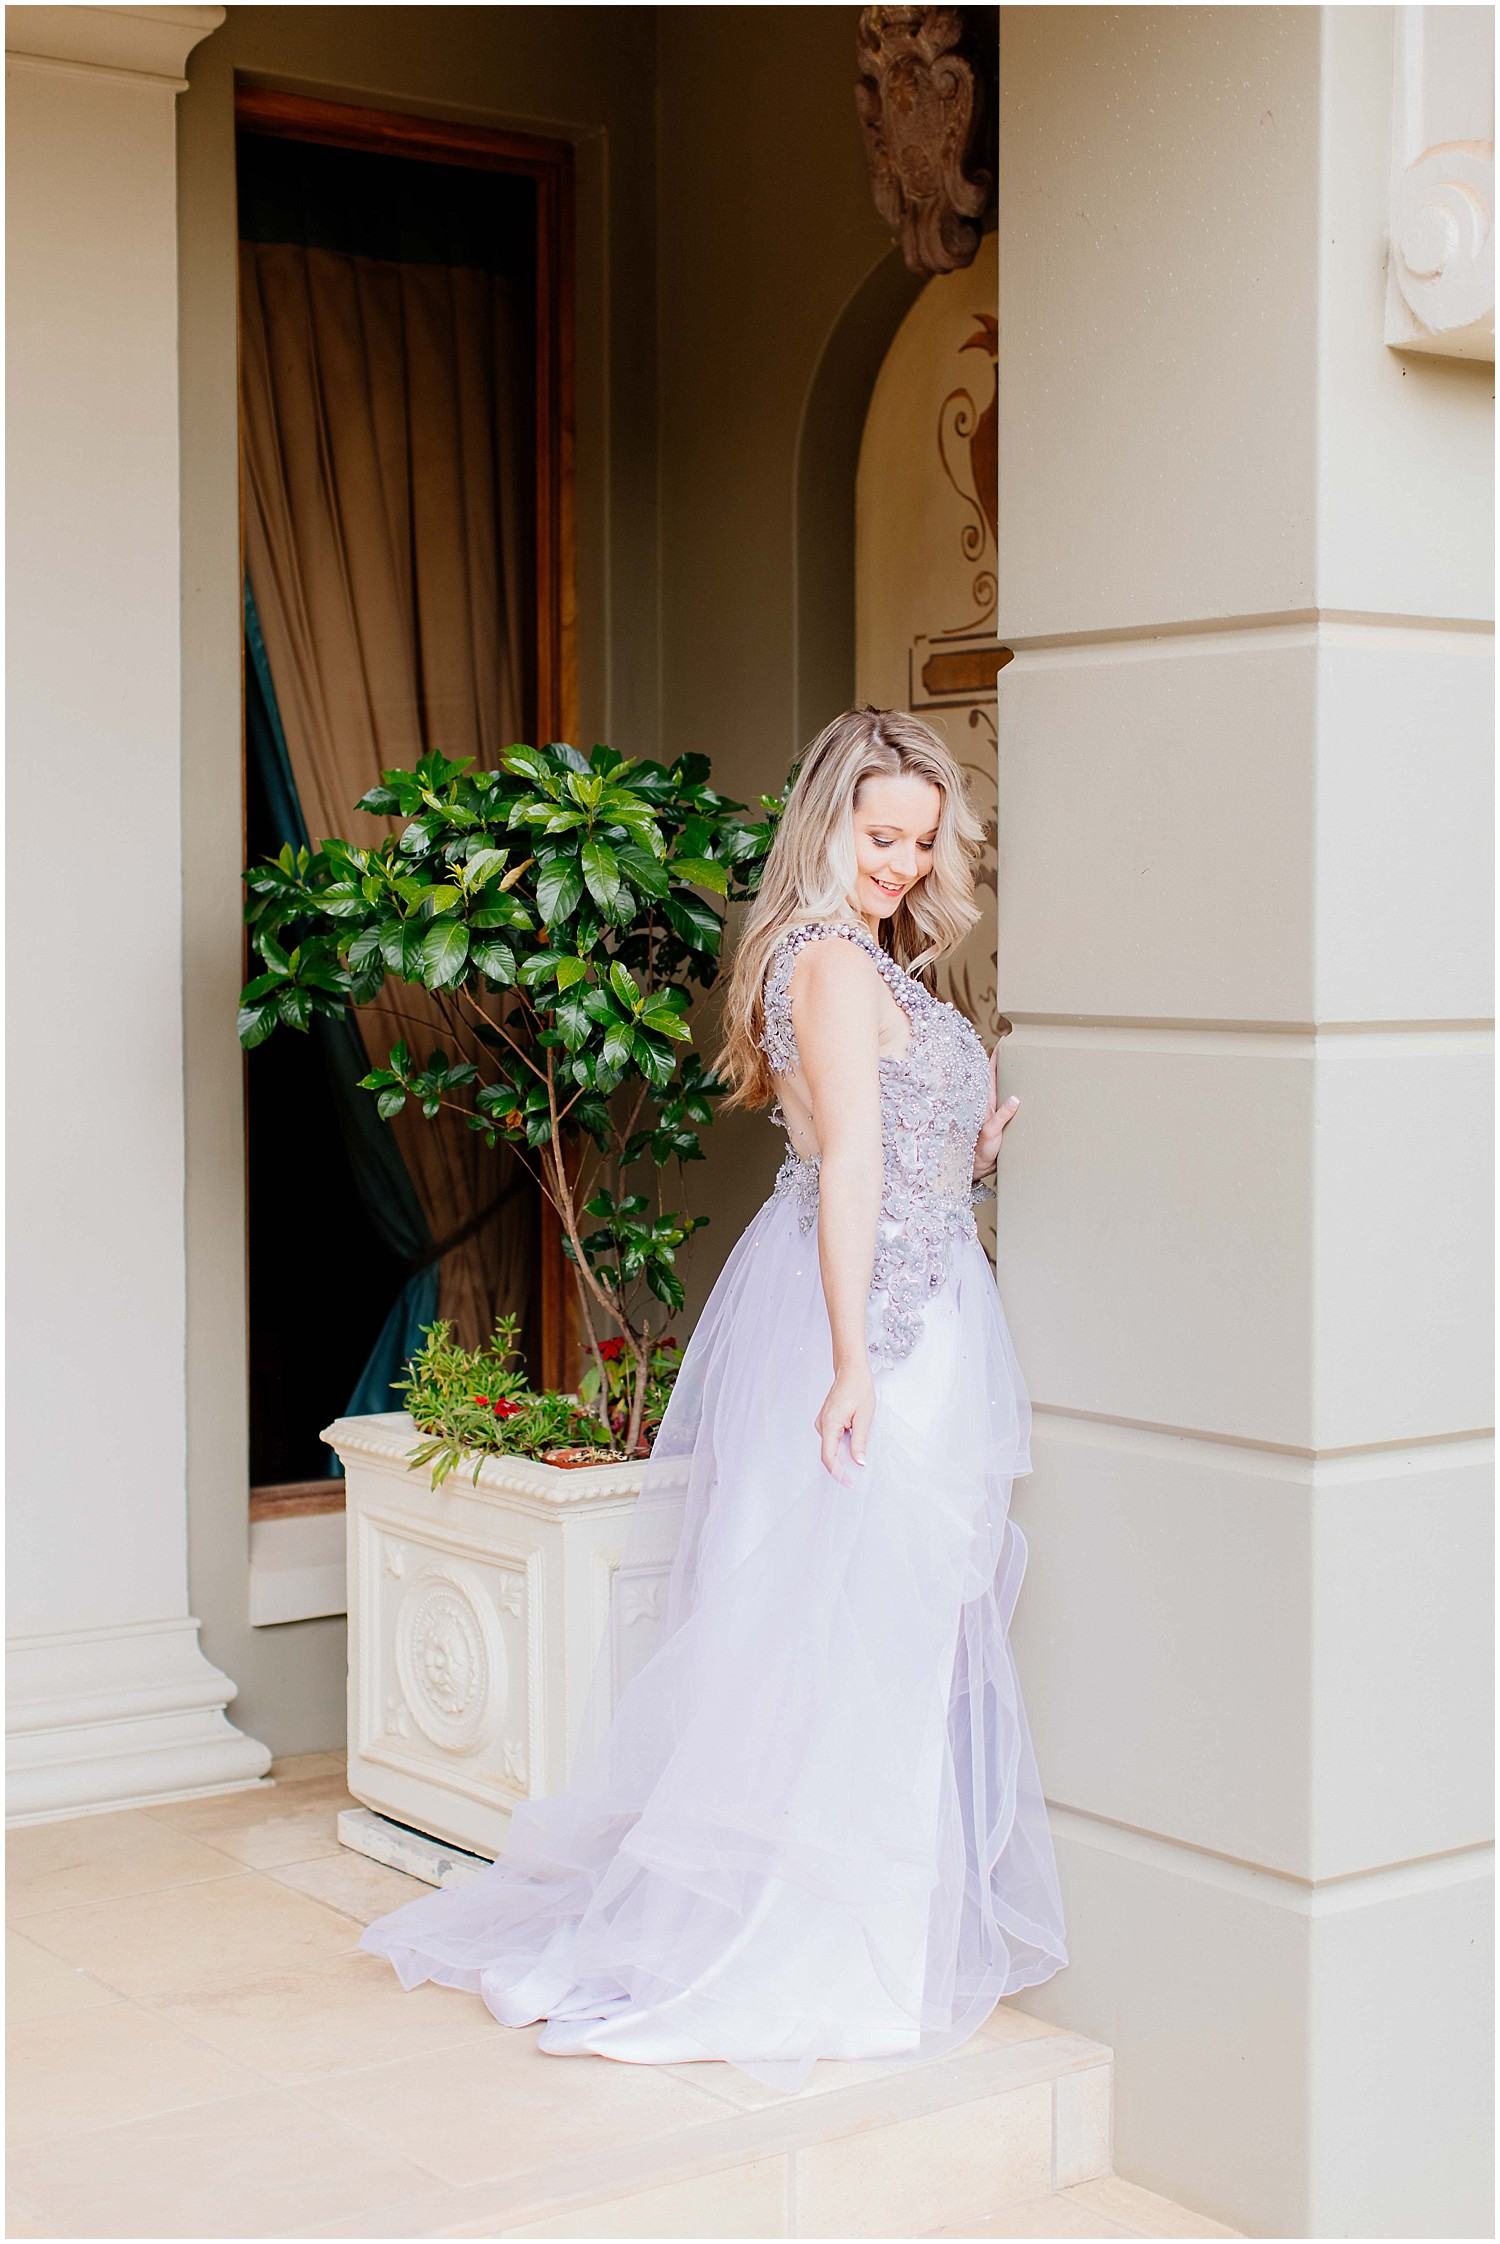 rolene-photography-cordelia-sangeres-engagement-shoot-parys_0009.jpg